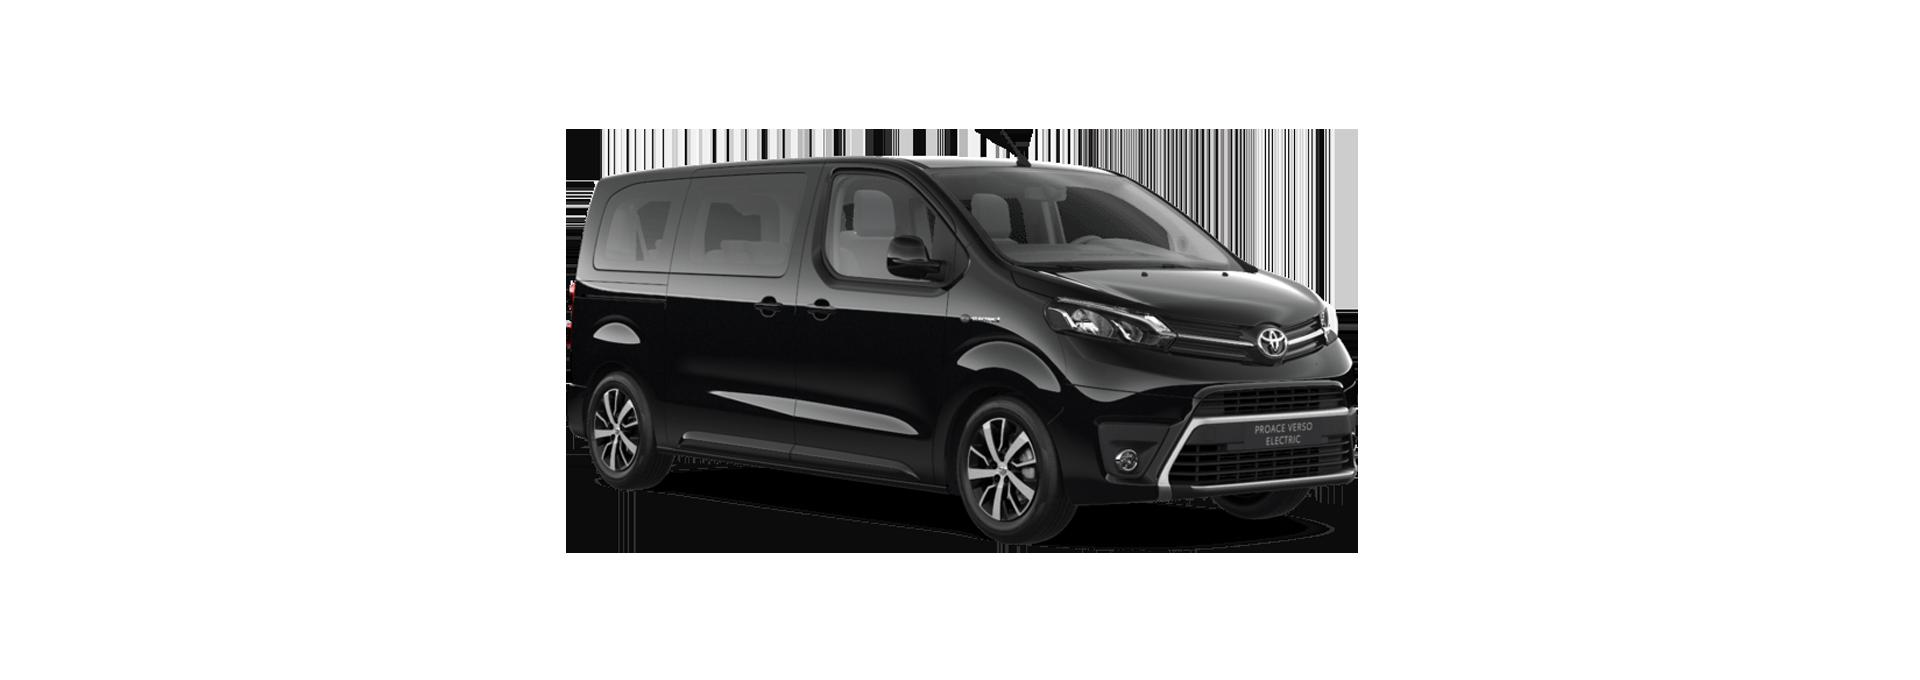 Toyota Nuevo Proace Verso Electric